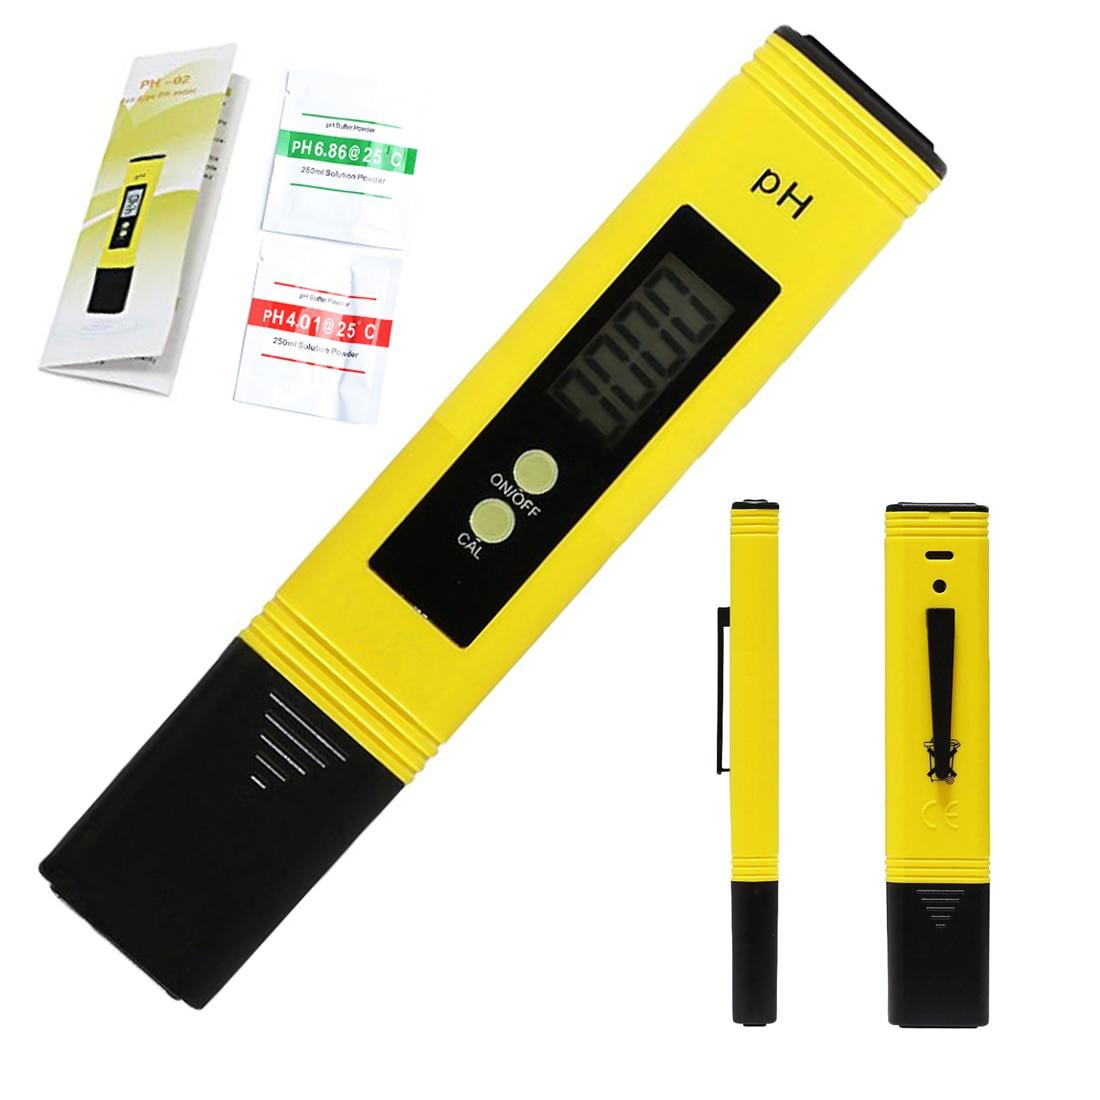 digital-lcd-ph-meter-pen-of-tester-accuracy-01-aquarium-pool-water-wine-urine-automatic-calibration